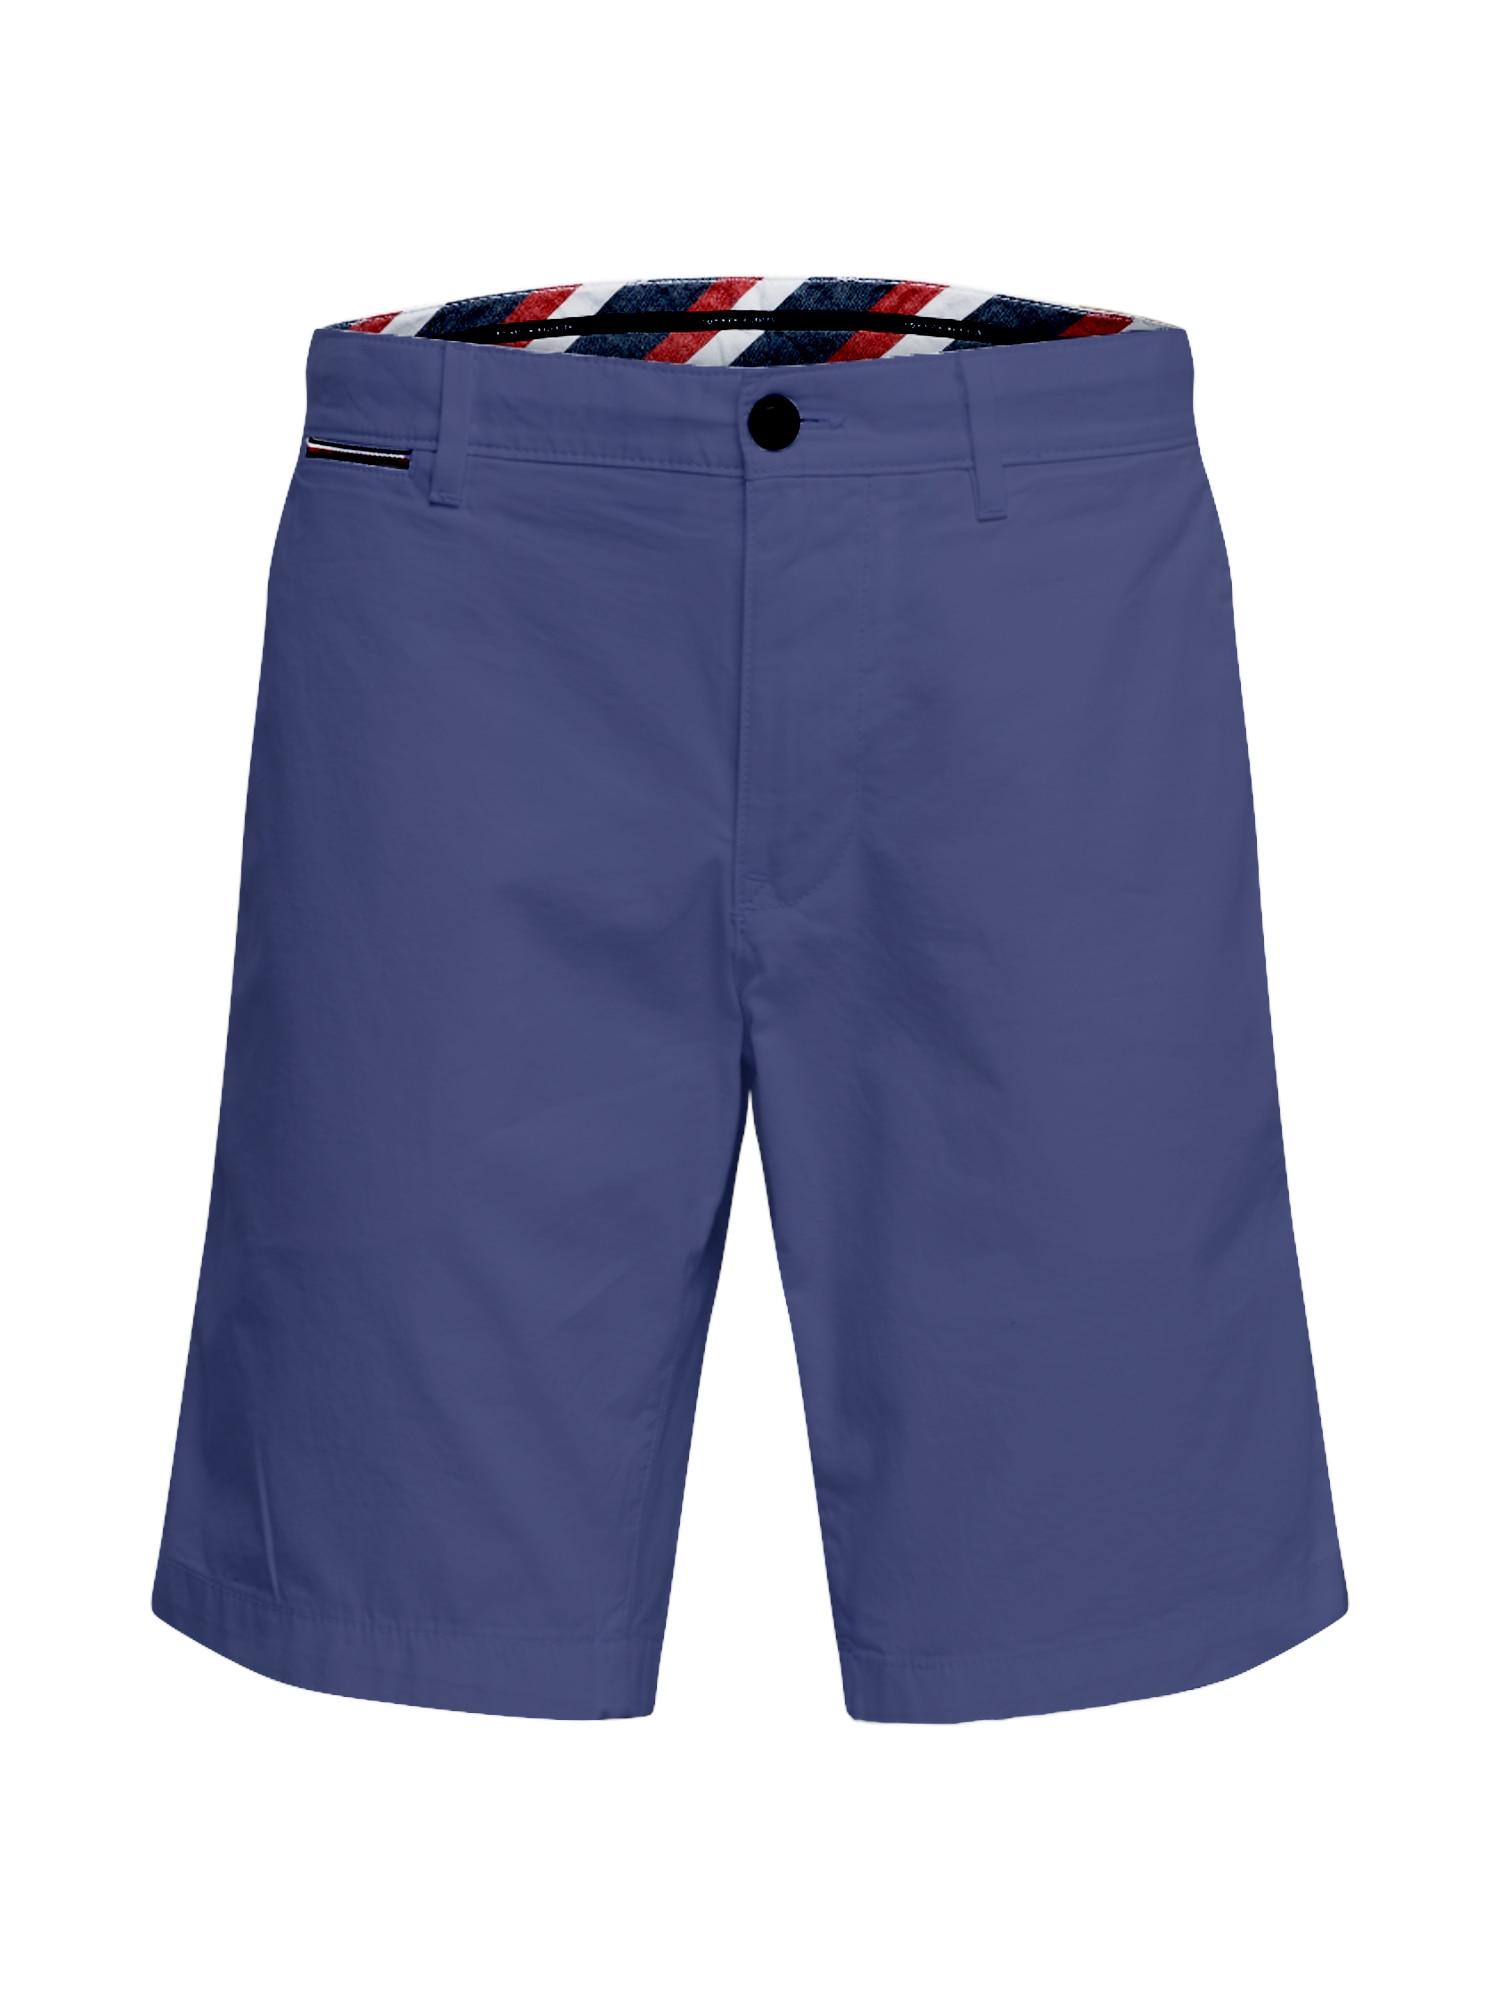 "TOMMY HILFIGER ""Chino"" stiliaus kelnės 'Brooklyn' tamsiai mėlyna"